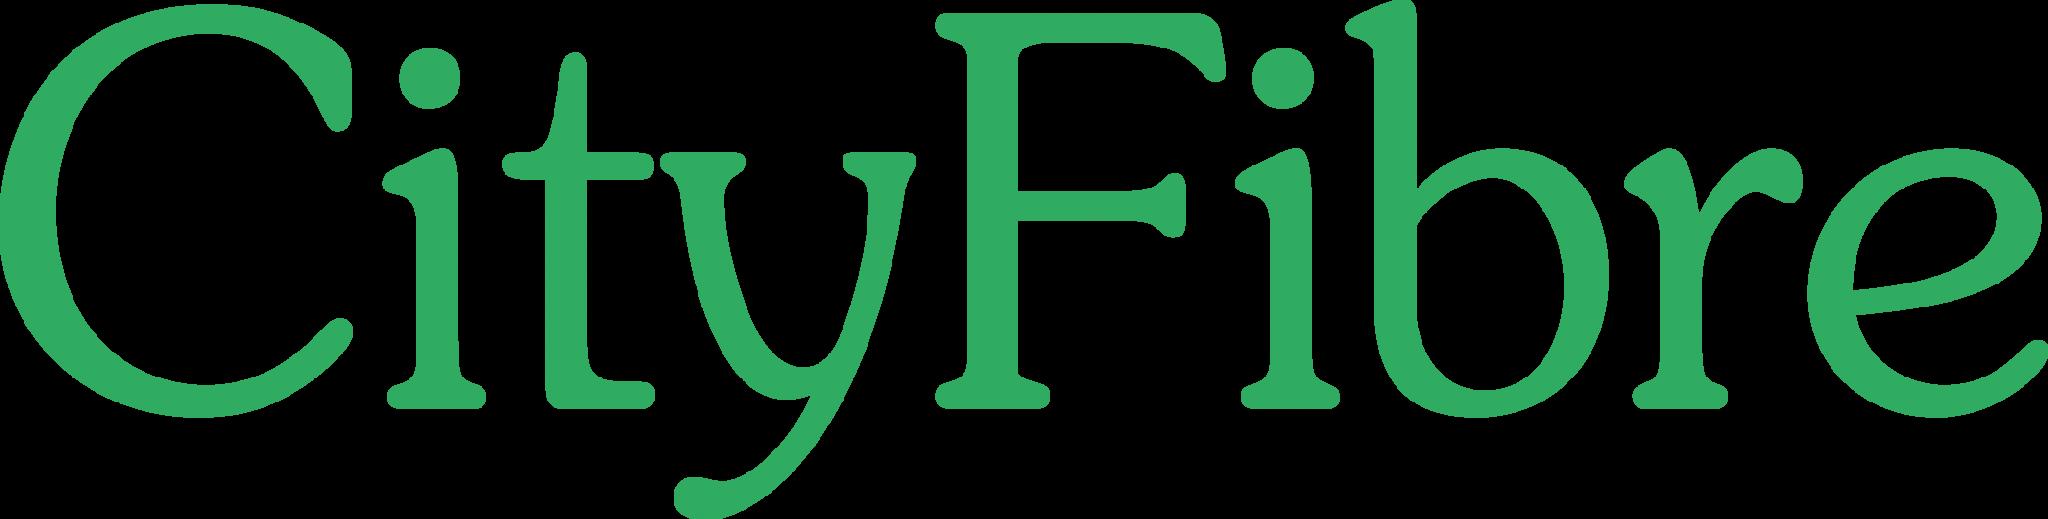 CF-logo-New-Green-1